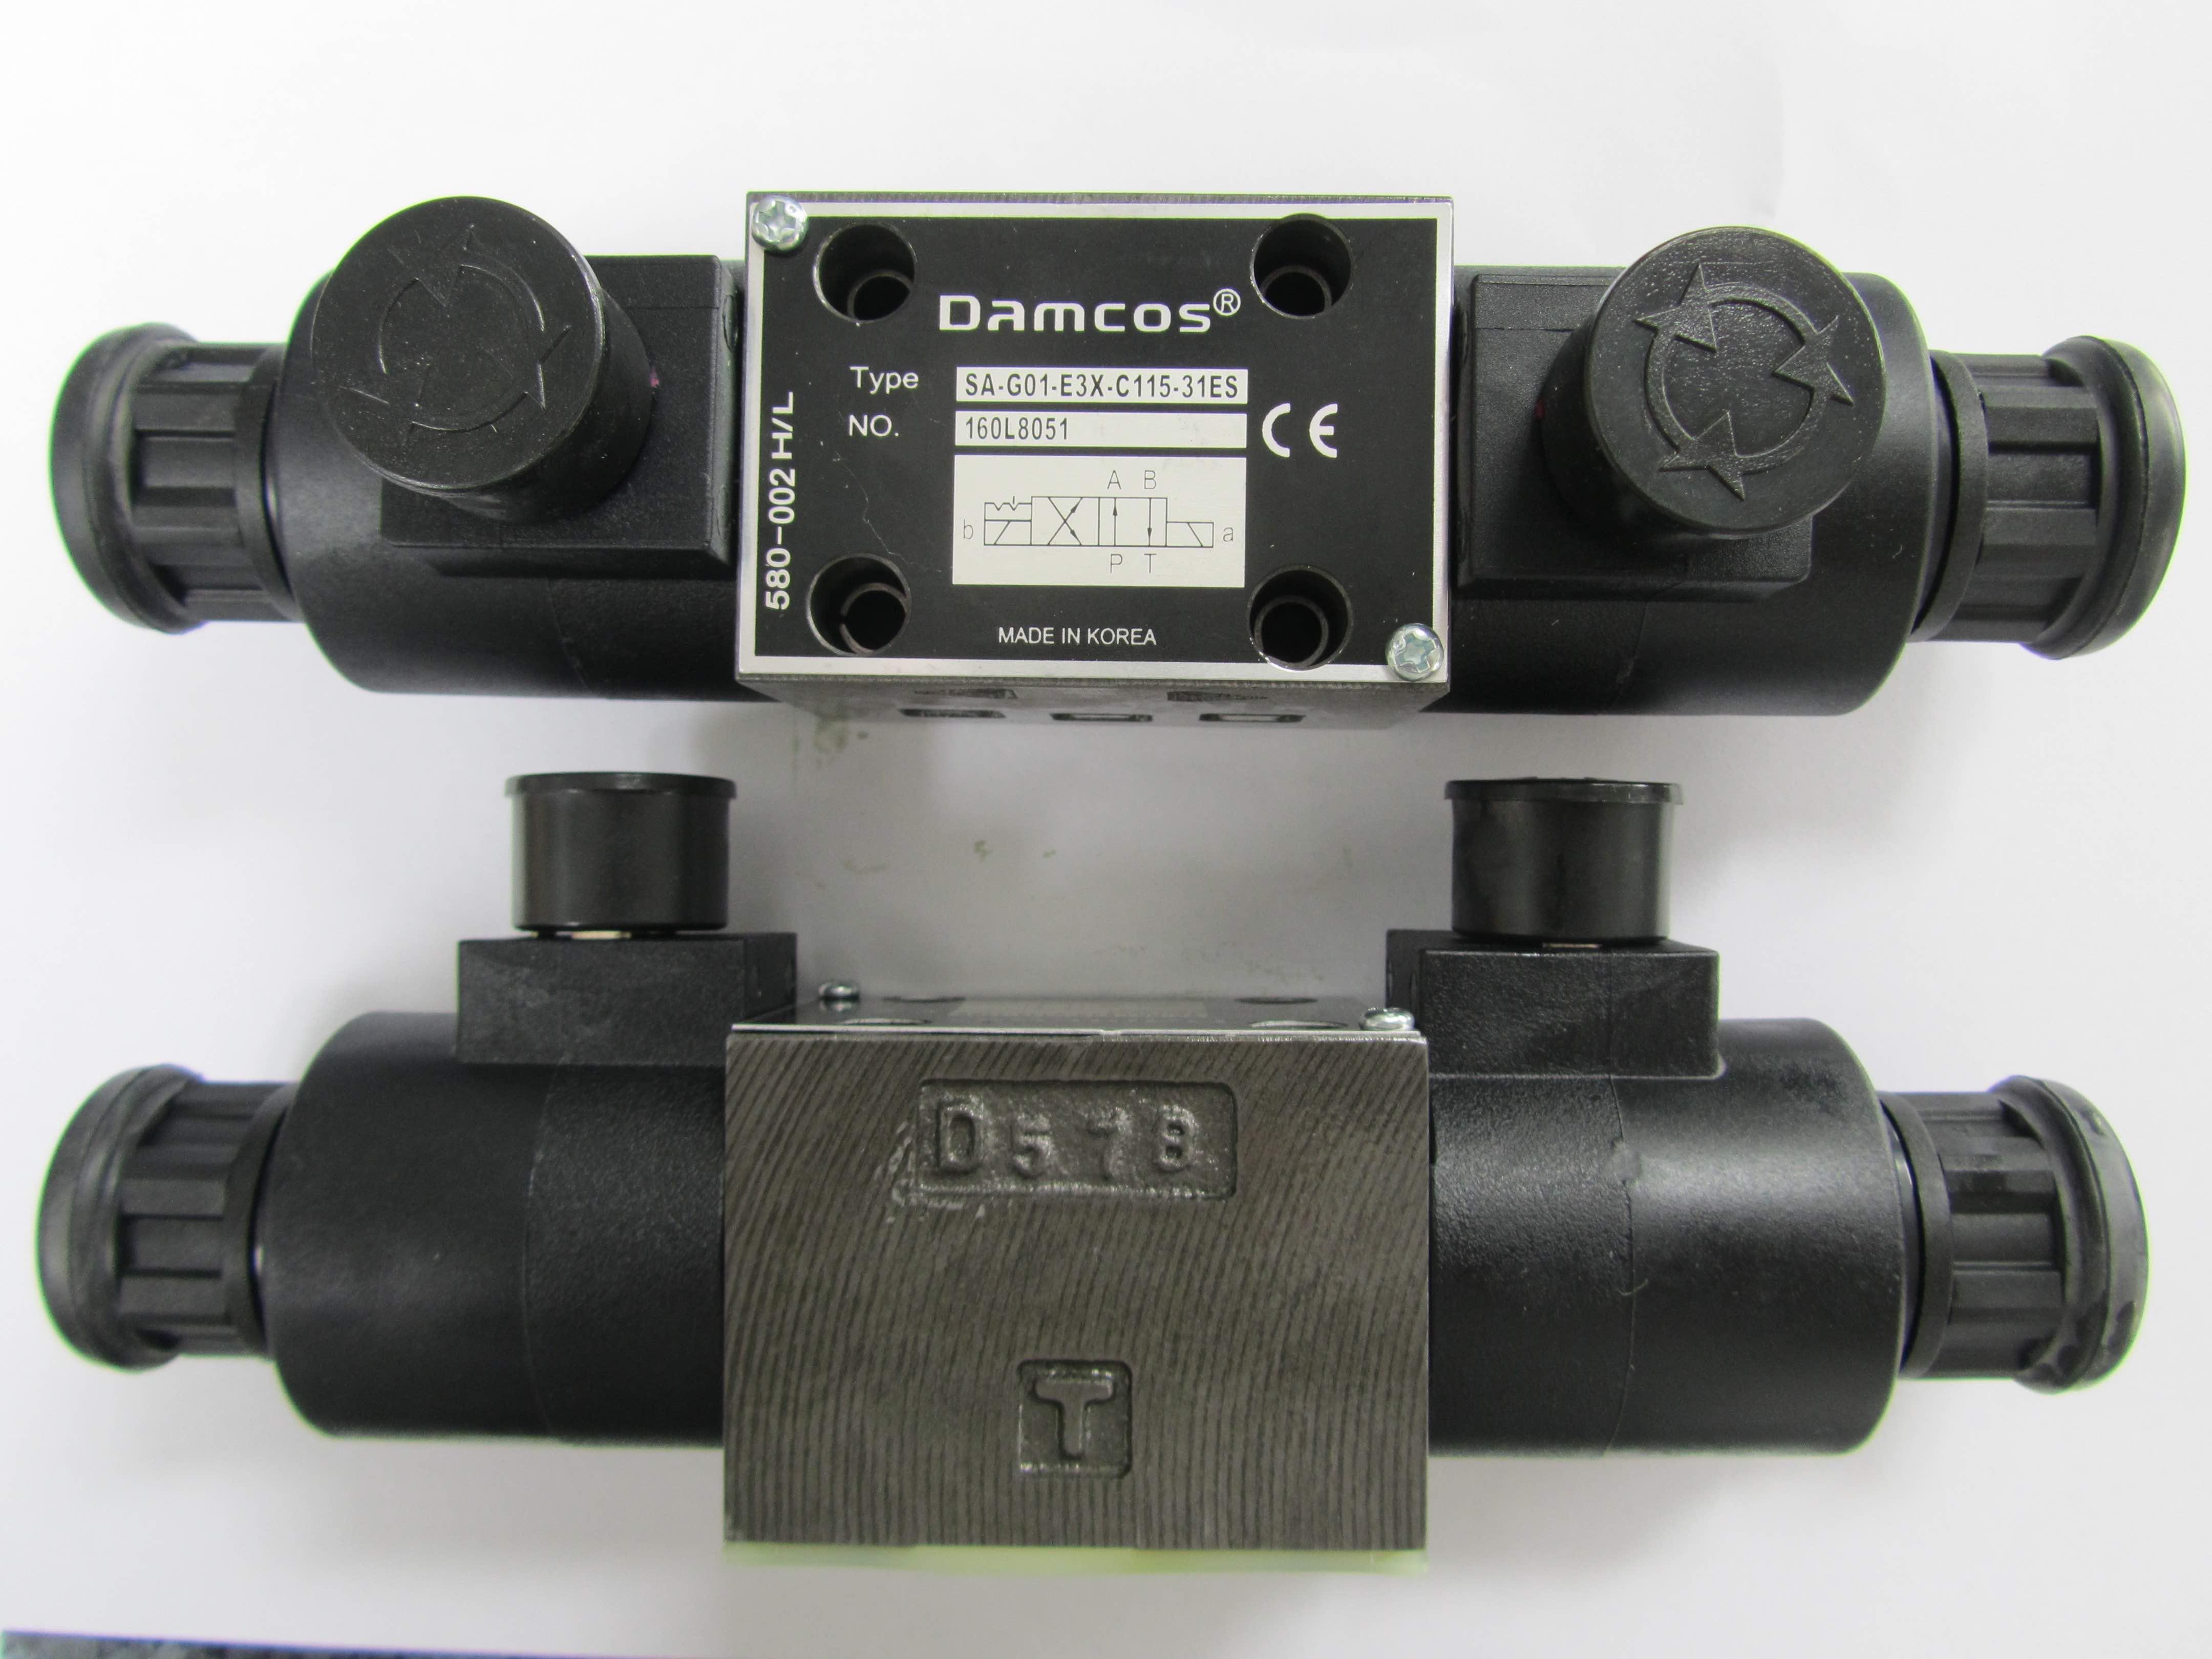 Damcos-160L8051